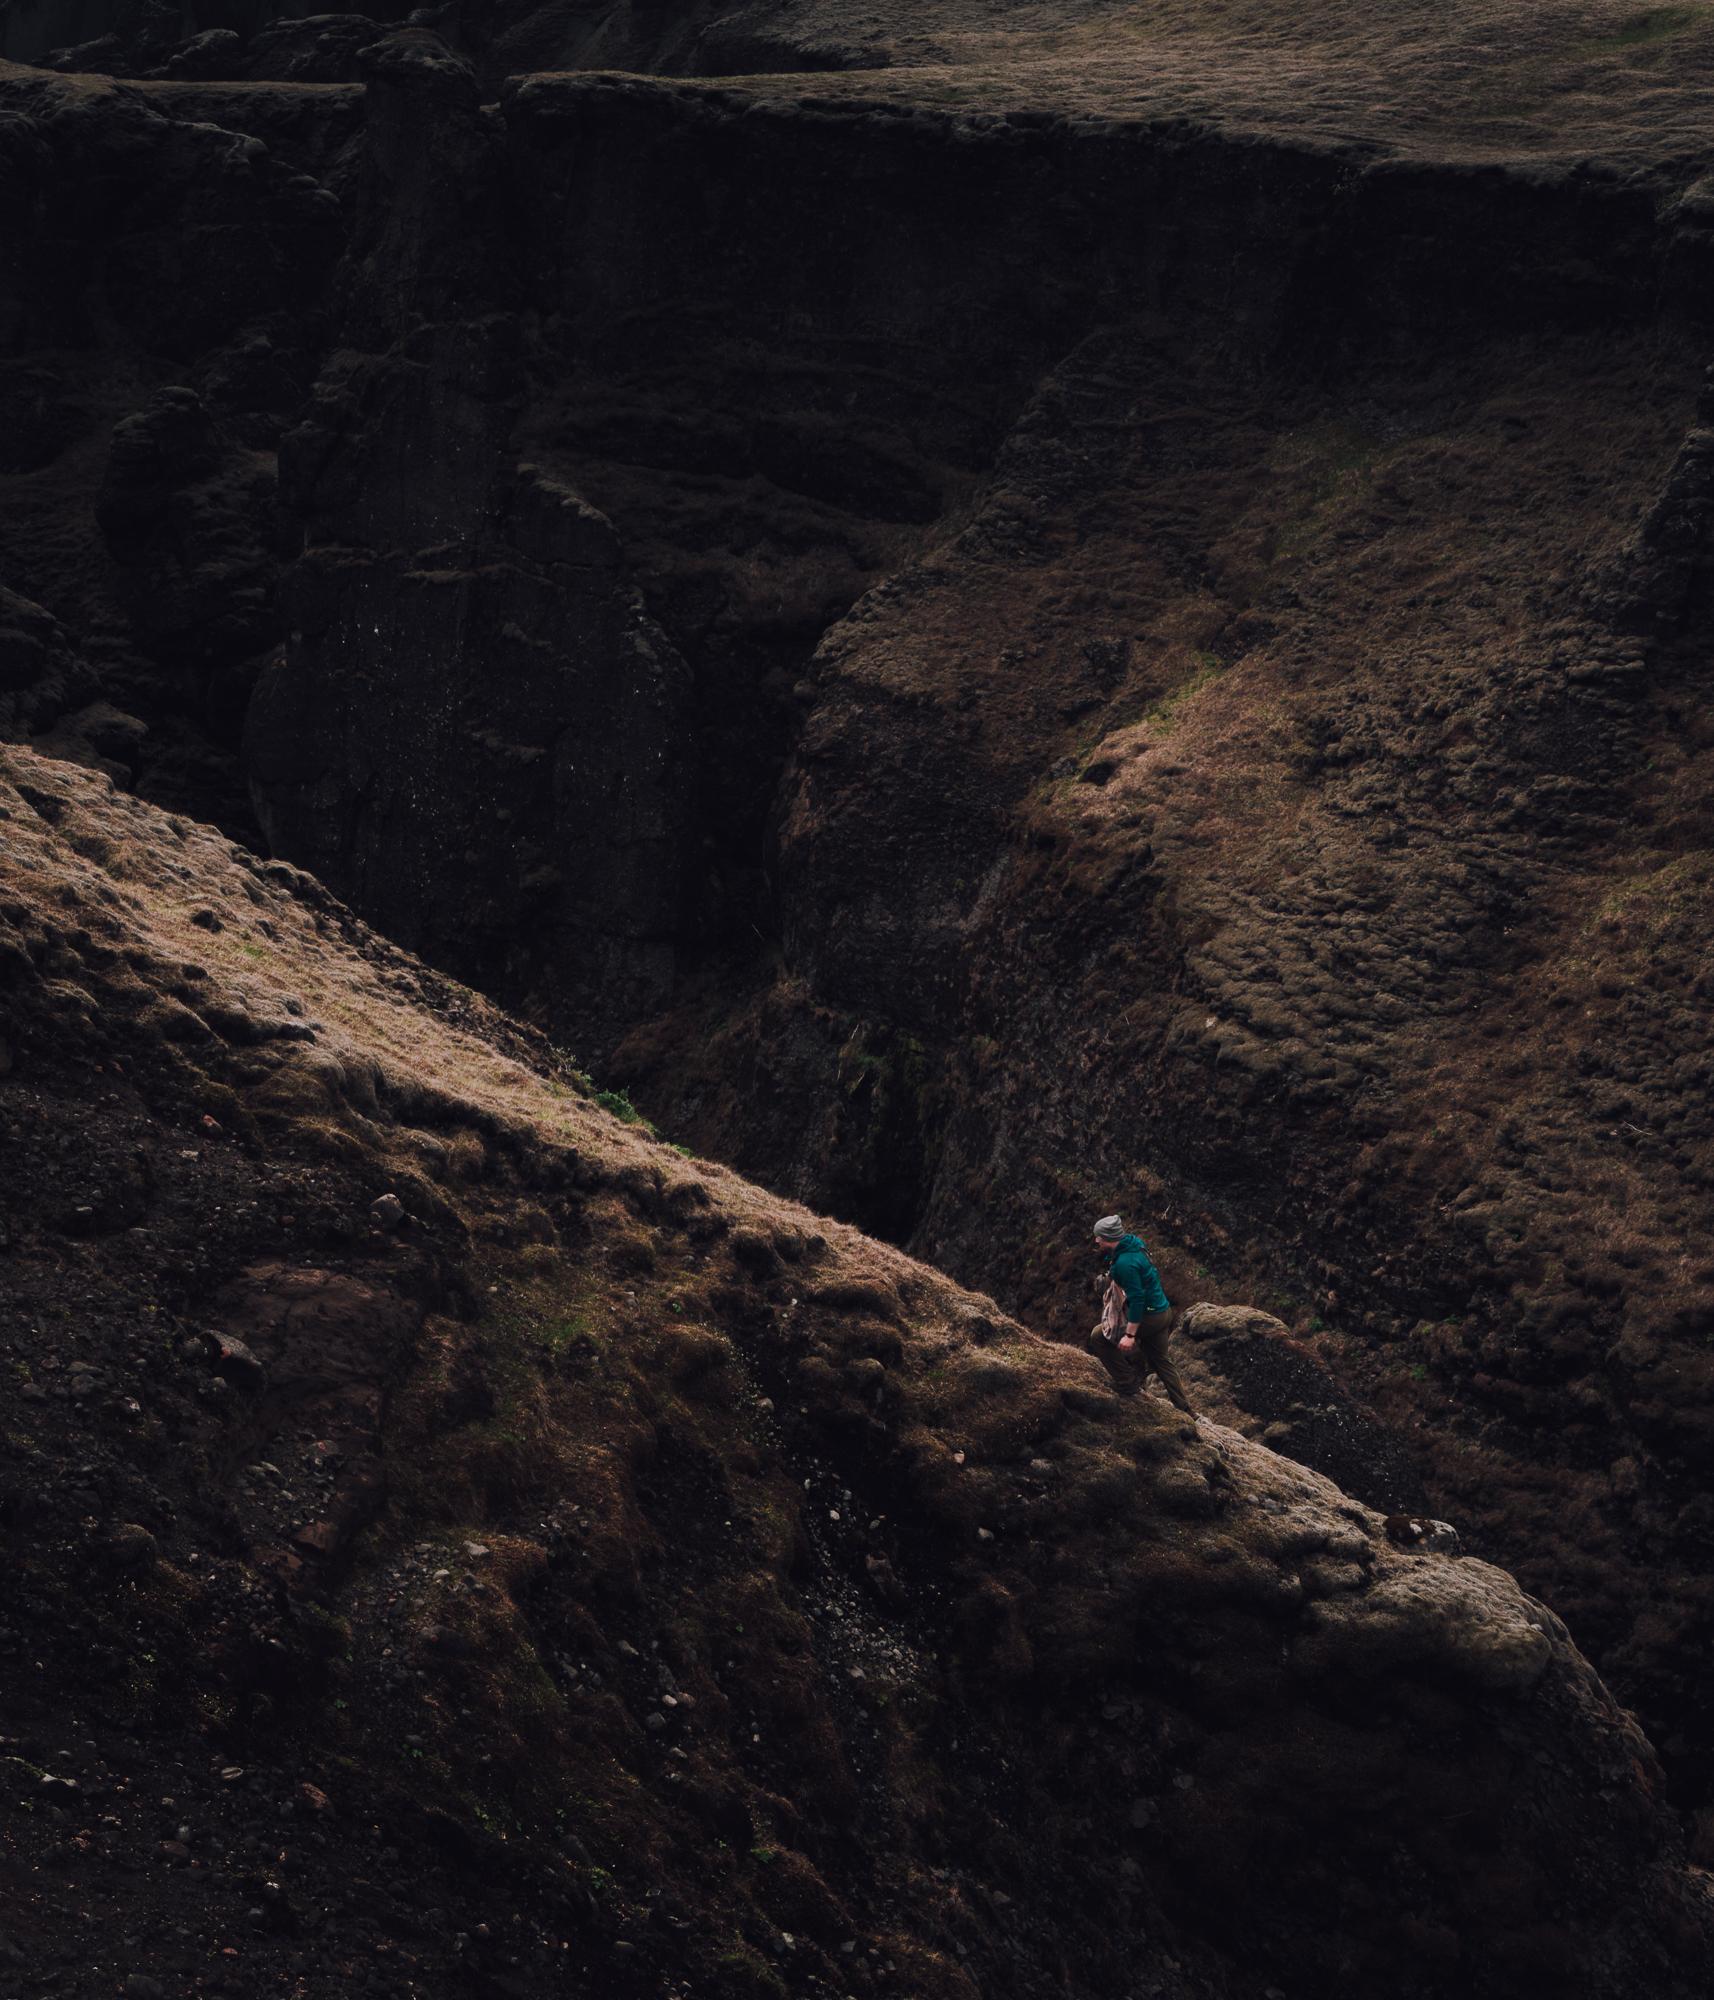 _LFH2935_Iceland.jpg